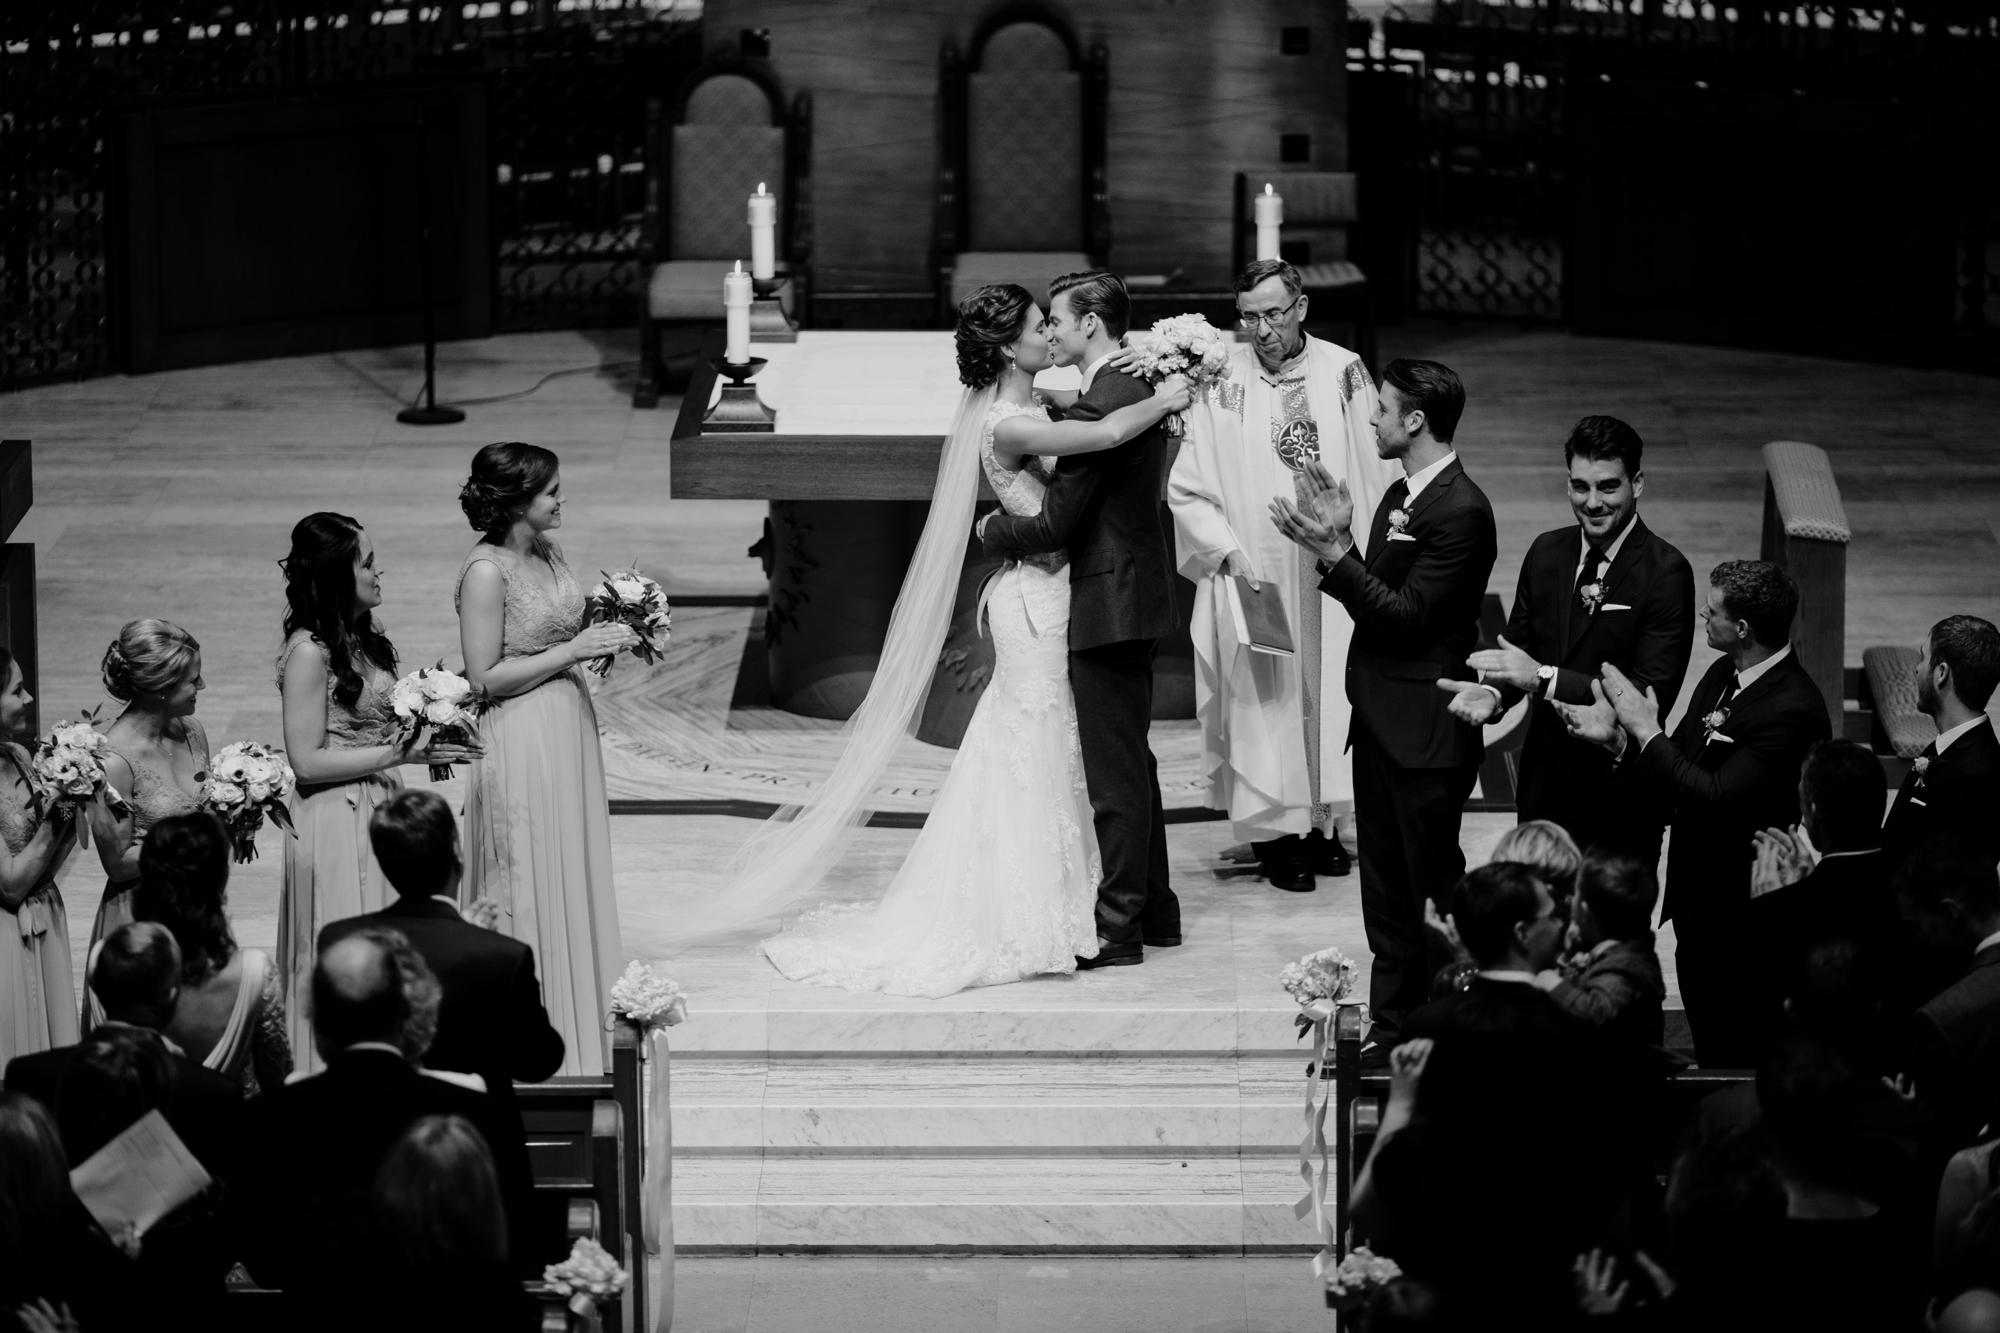 Nicollet-Island-Pavilion-Winter-Wedding-Minneapolis_36.jpg